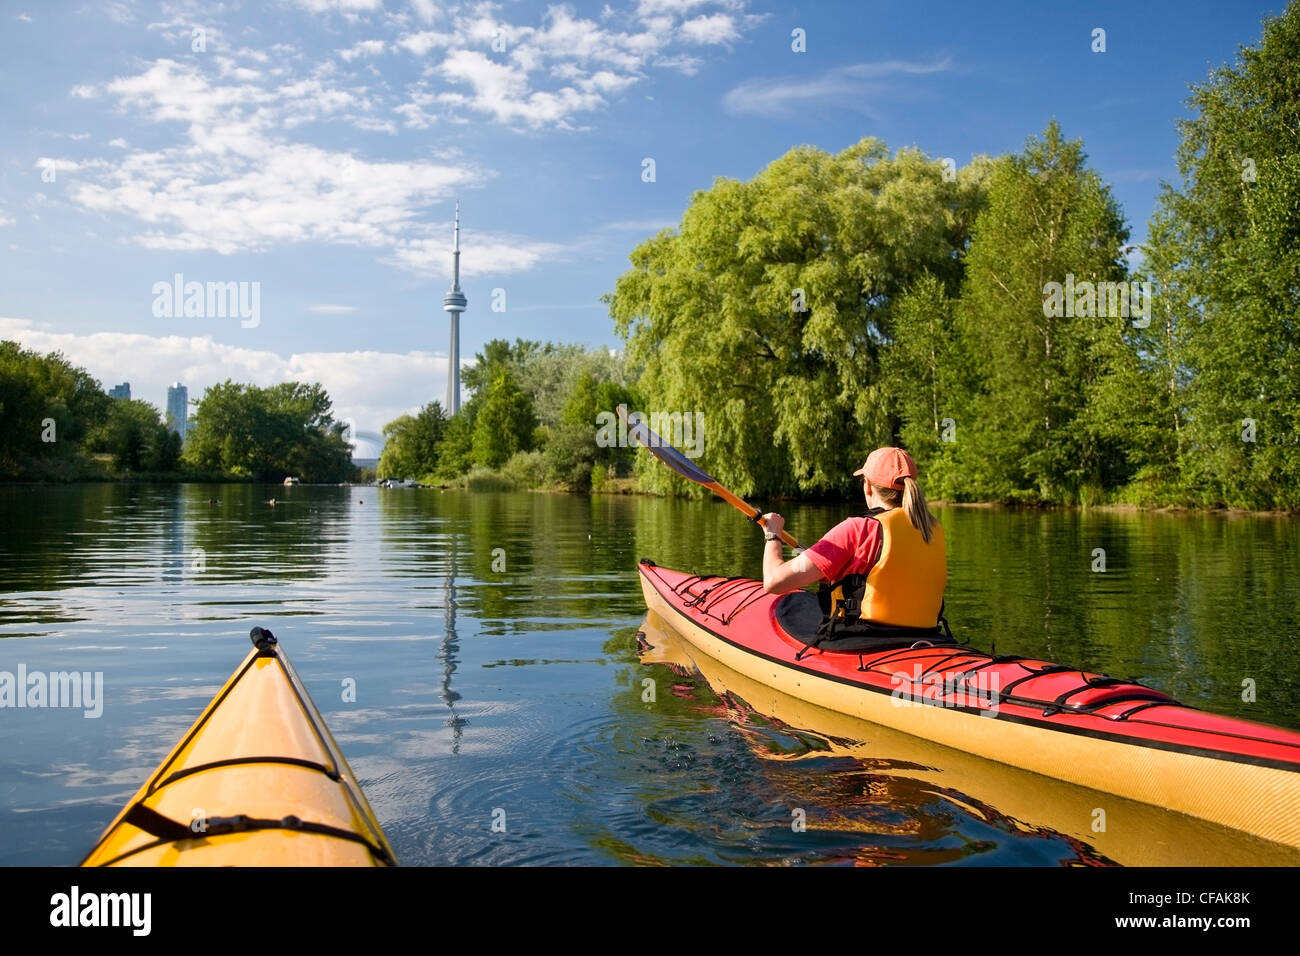 Woman Kayaking By Harbor Stock Photos Amp Woman Kayaking By